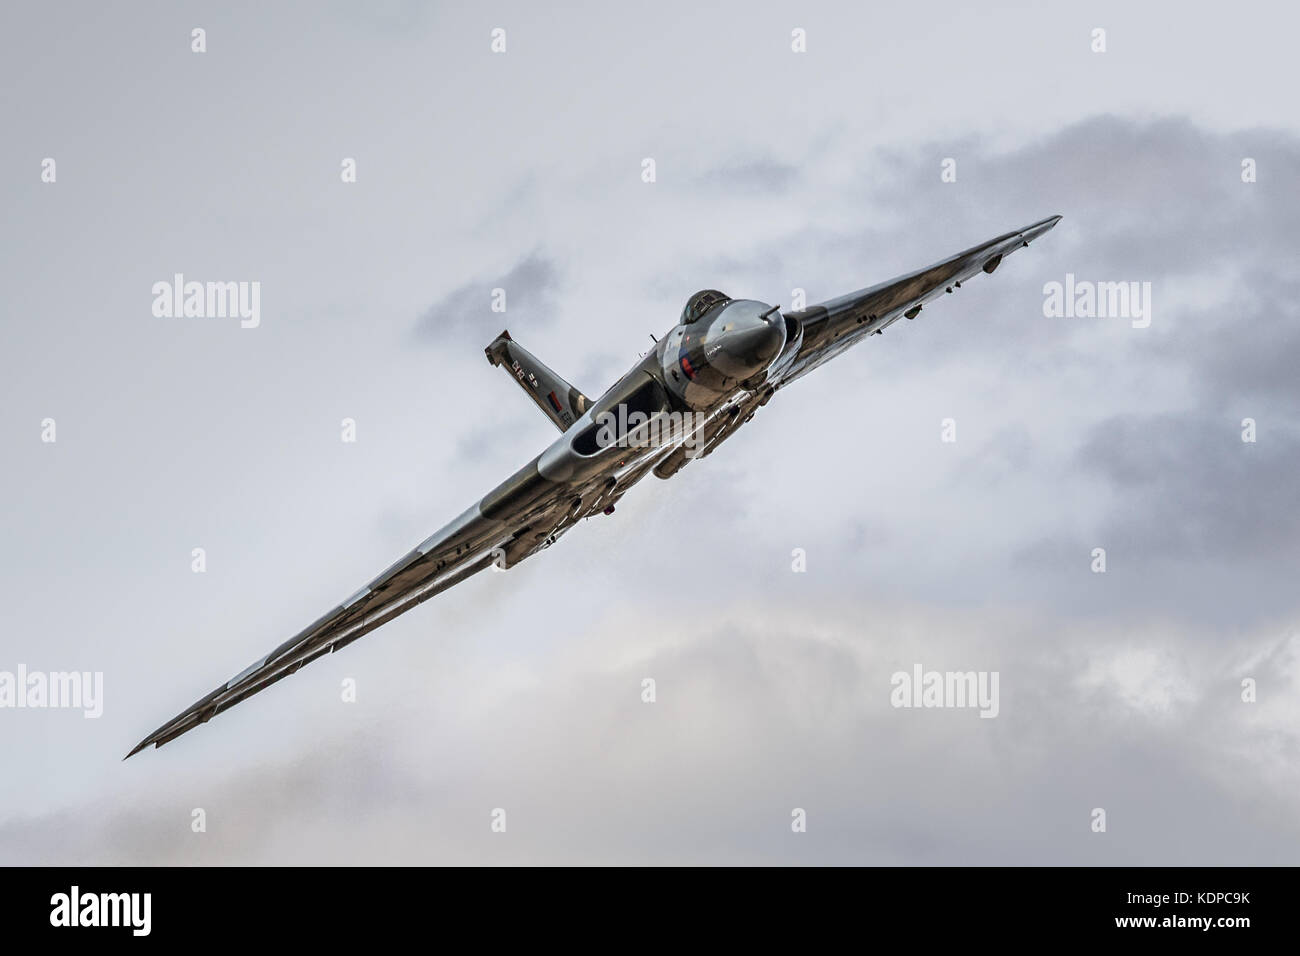 XH558 Vulcan Bomber displaying at RIAT, Royal international Air Tattoo at RAF Fairford, England, UK - Stock Image